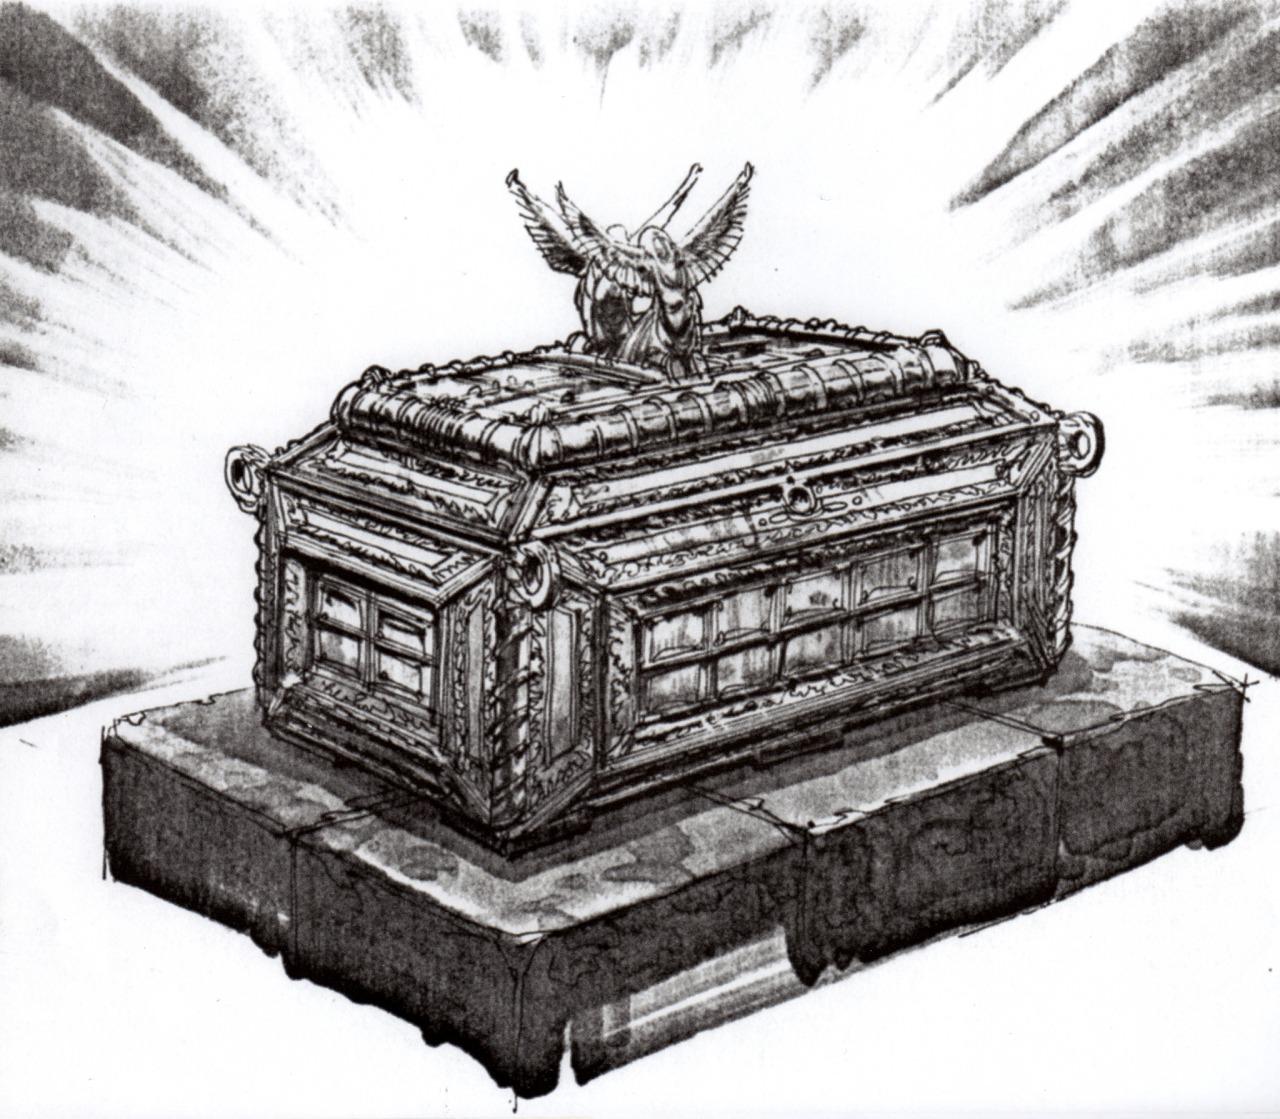 raiders-of-the-lost-ark-concept-art-by-joe-johnston